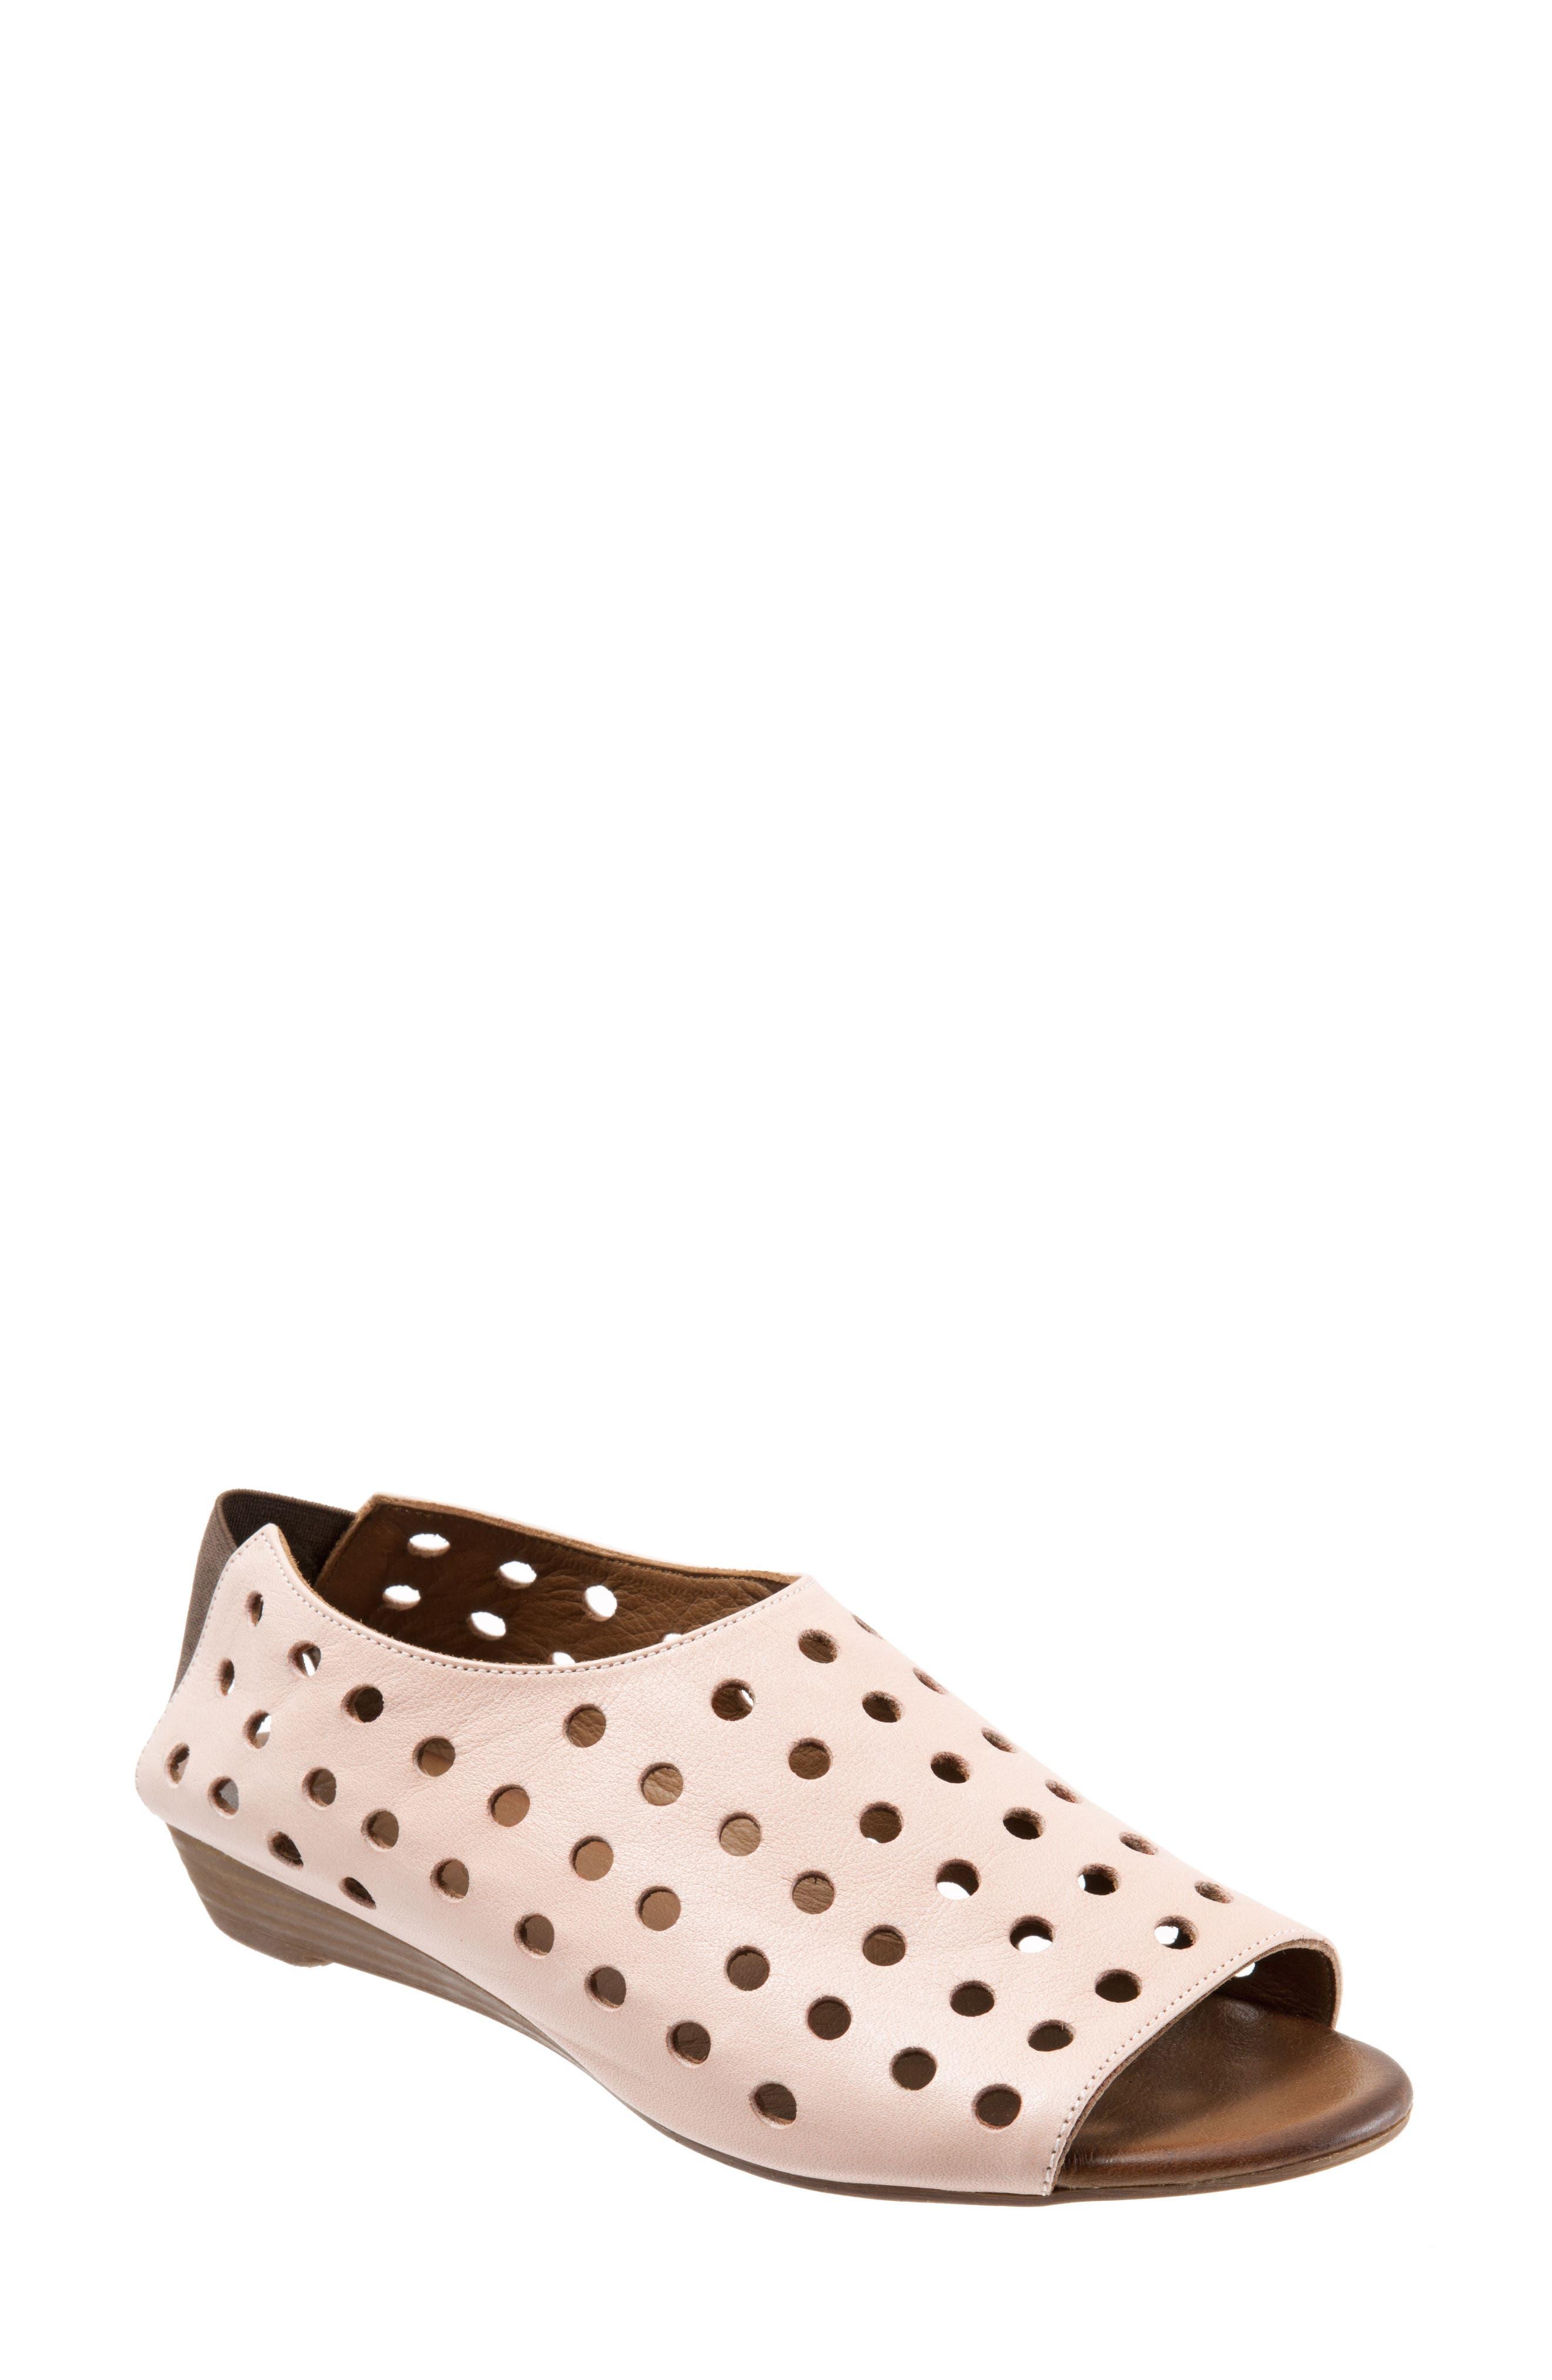 Addison Sandal,                             Main thumbnail 1, color,                             Pale Pink Leather